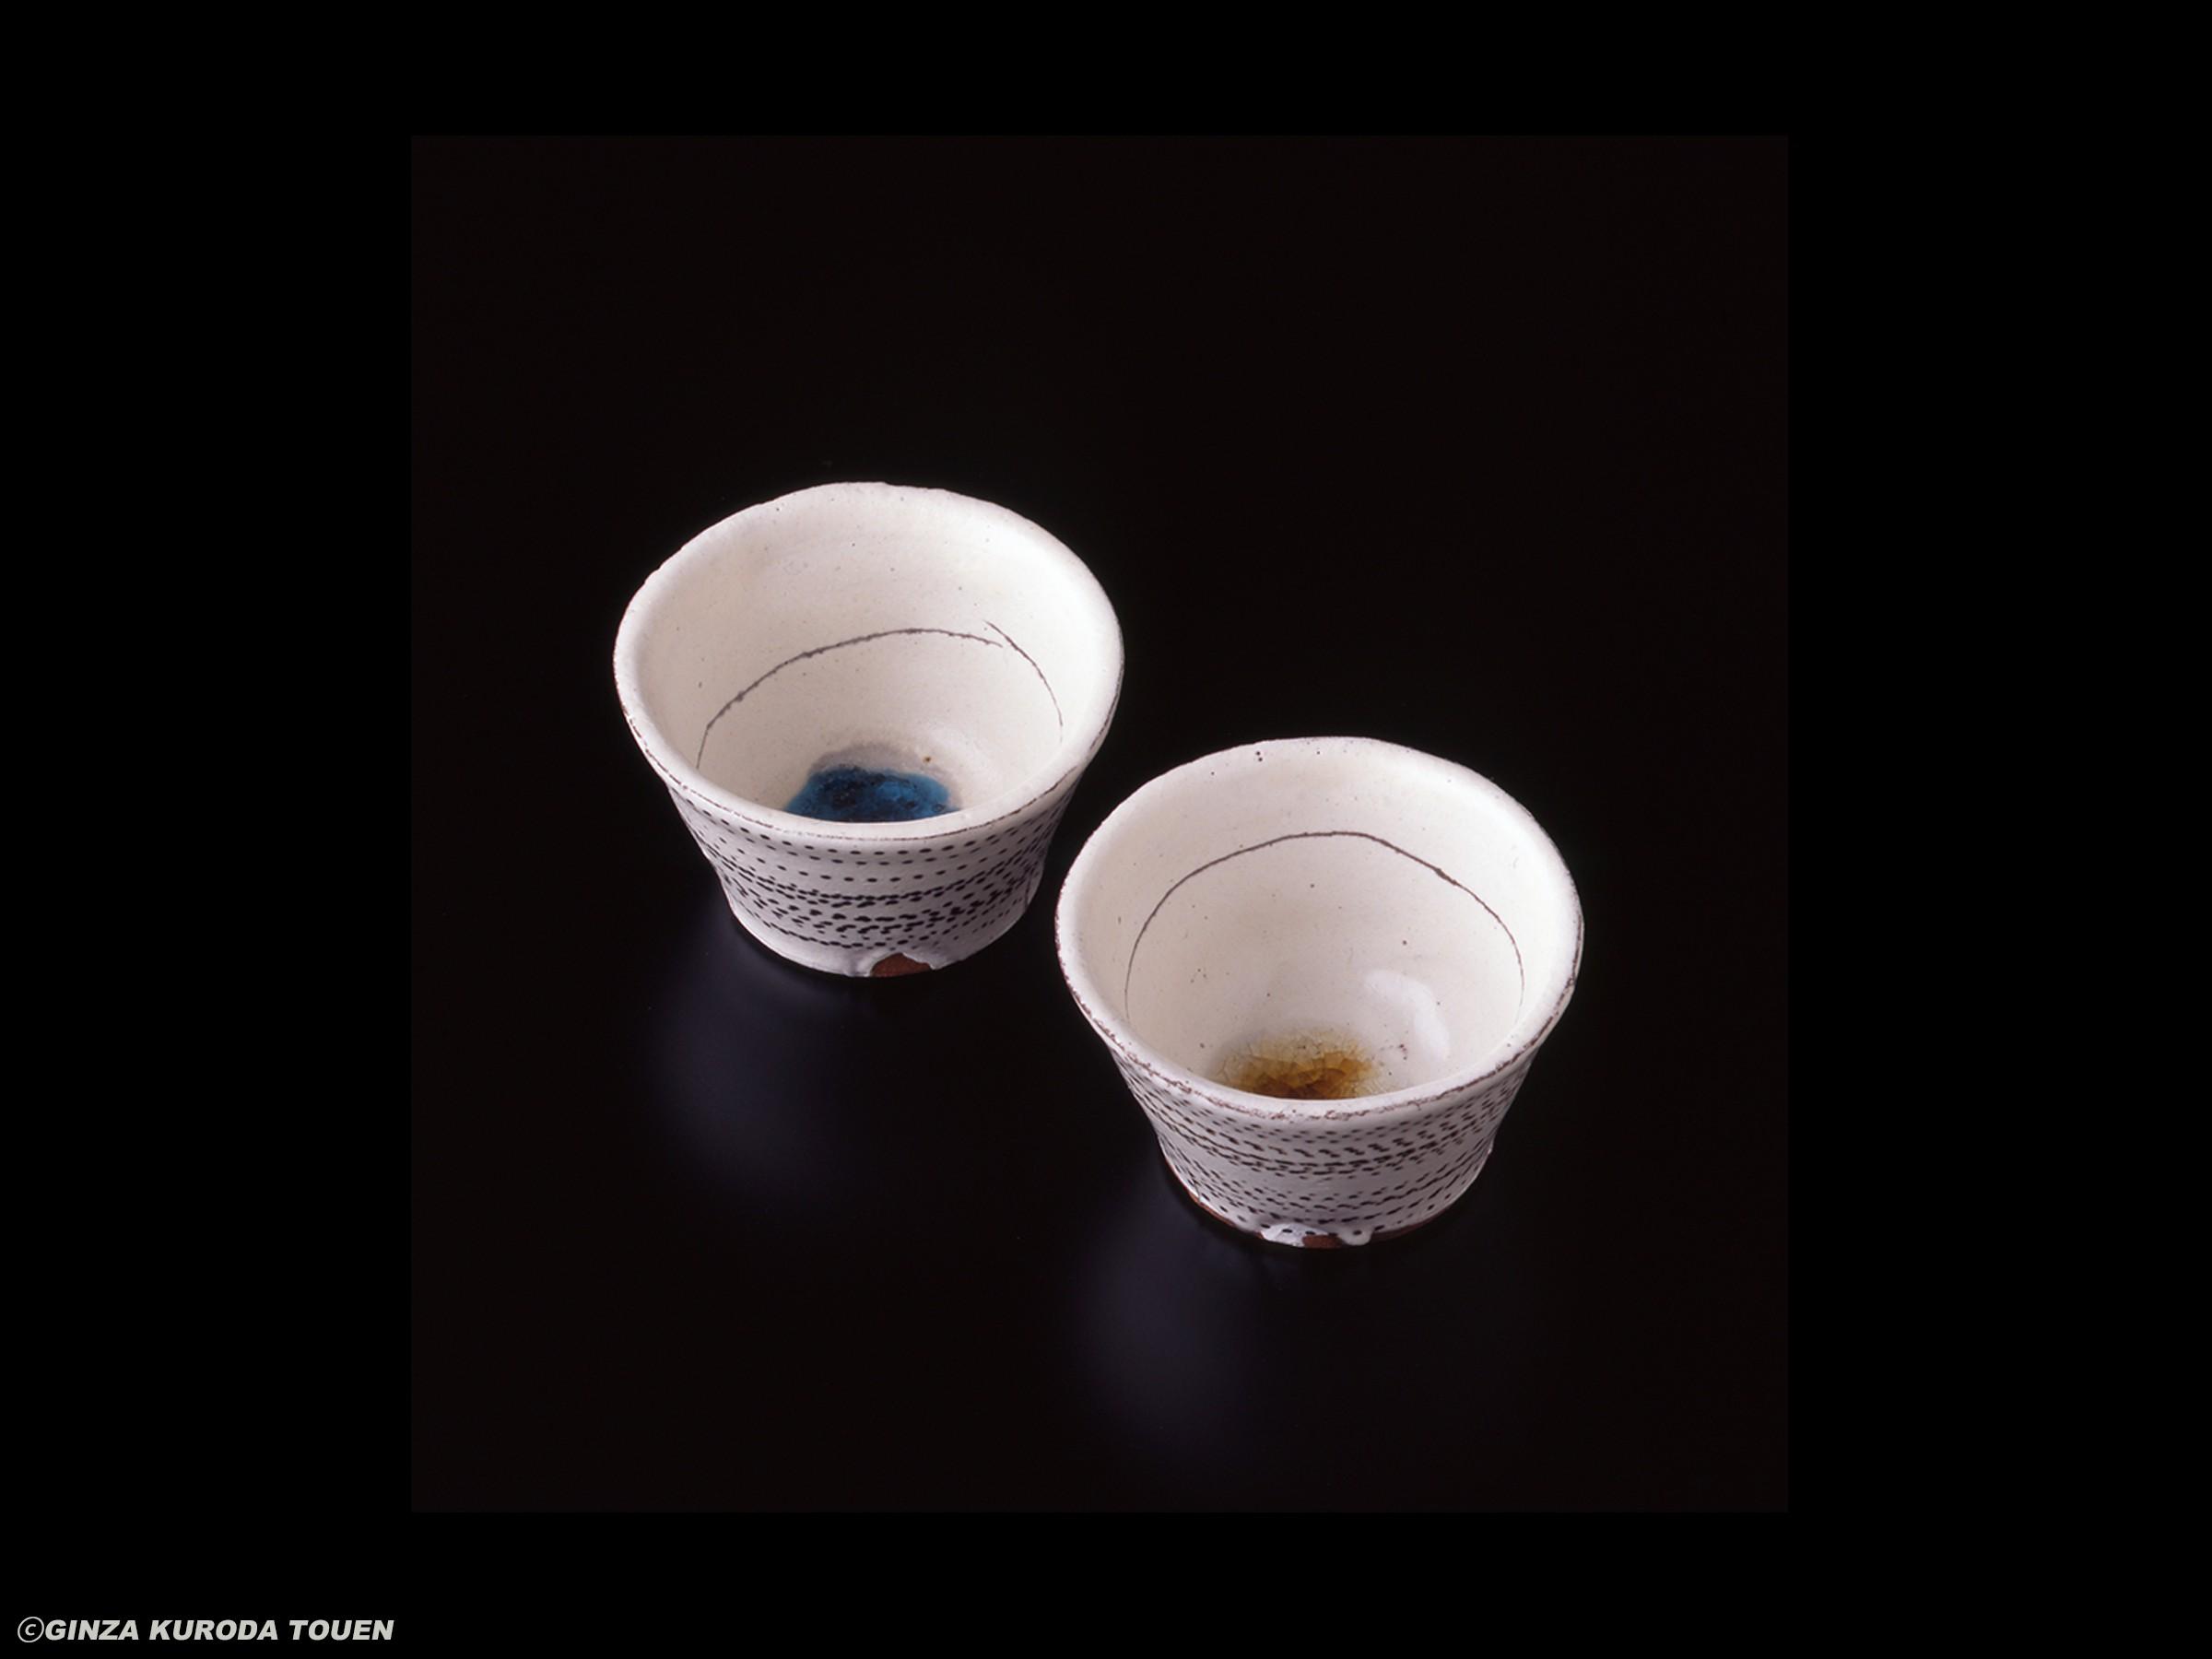 Kazuo yagi: A set of two white sake cups